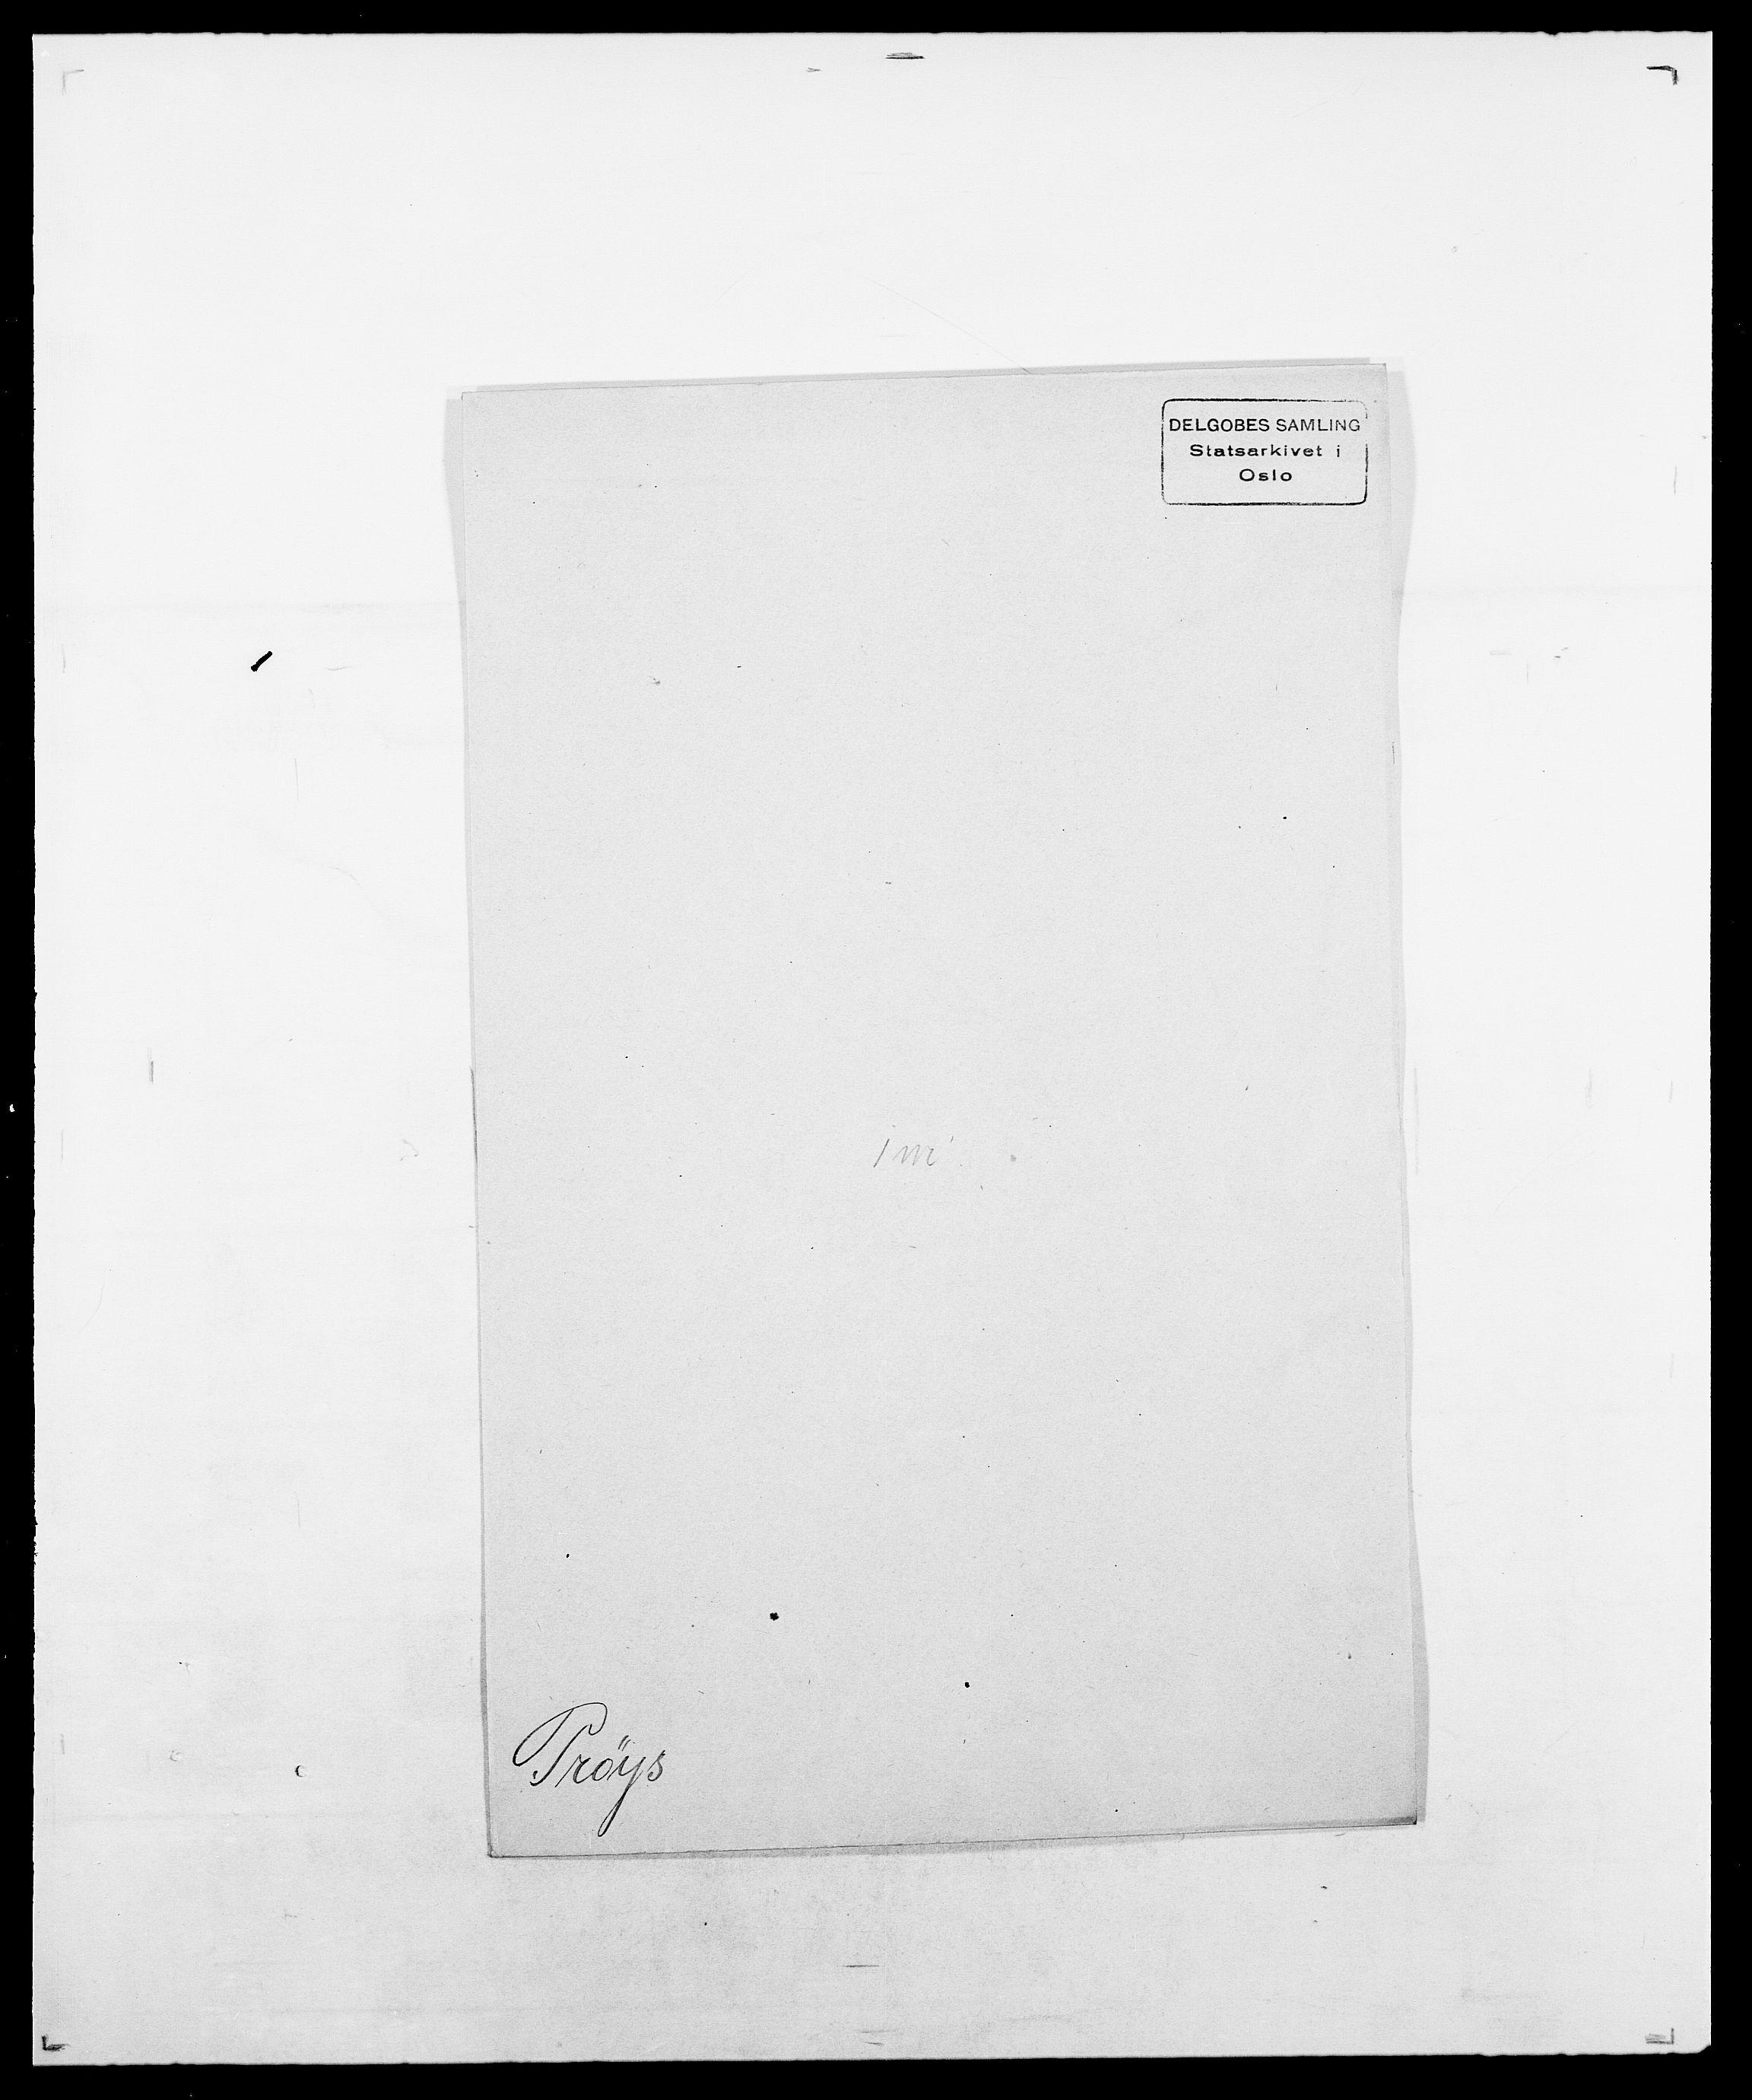 SAO, Delgobe, Charles Antoine - samling, D/Da/L0031: de Place - Raaum, s. 426